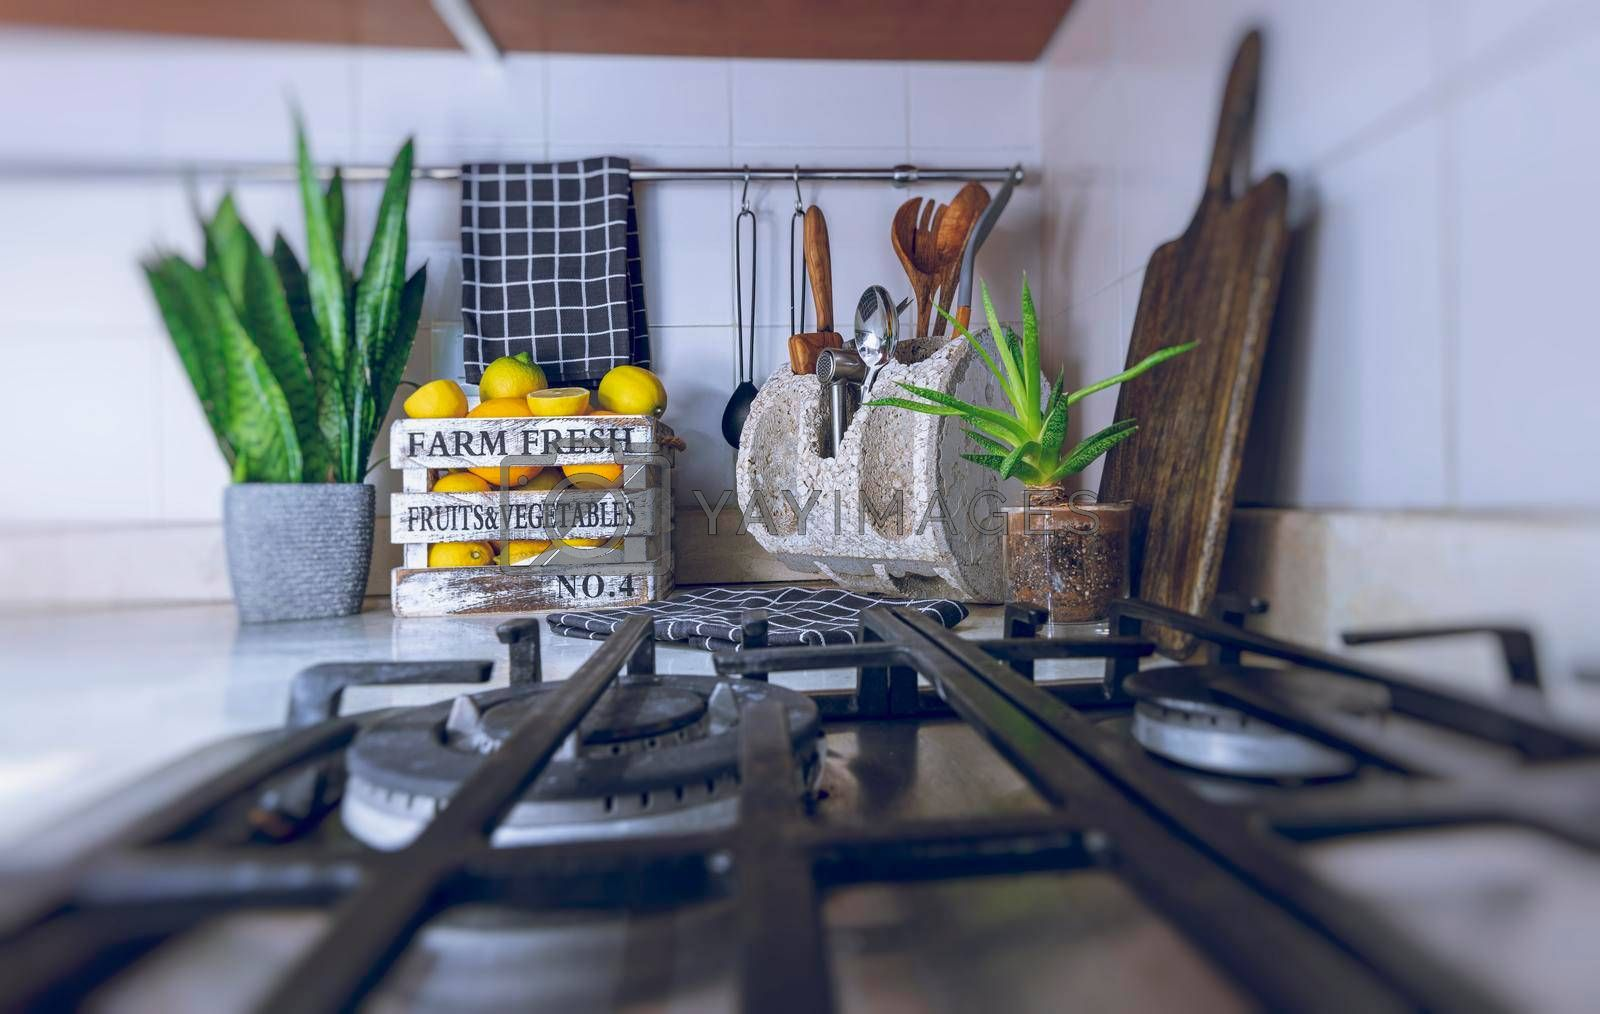 Beautiful Modern Kitchen Interior. Stylish Design Solution. Kitchen Objects. Fresh Ripe Lemons. Tasty Healthy Nutrition. Happy Home Life.